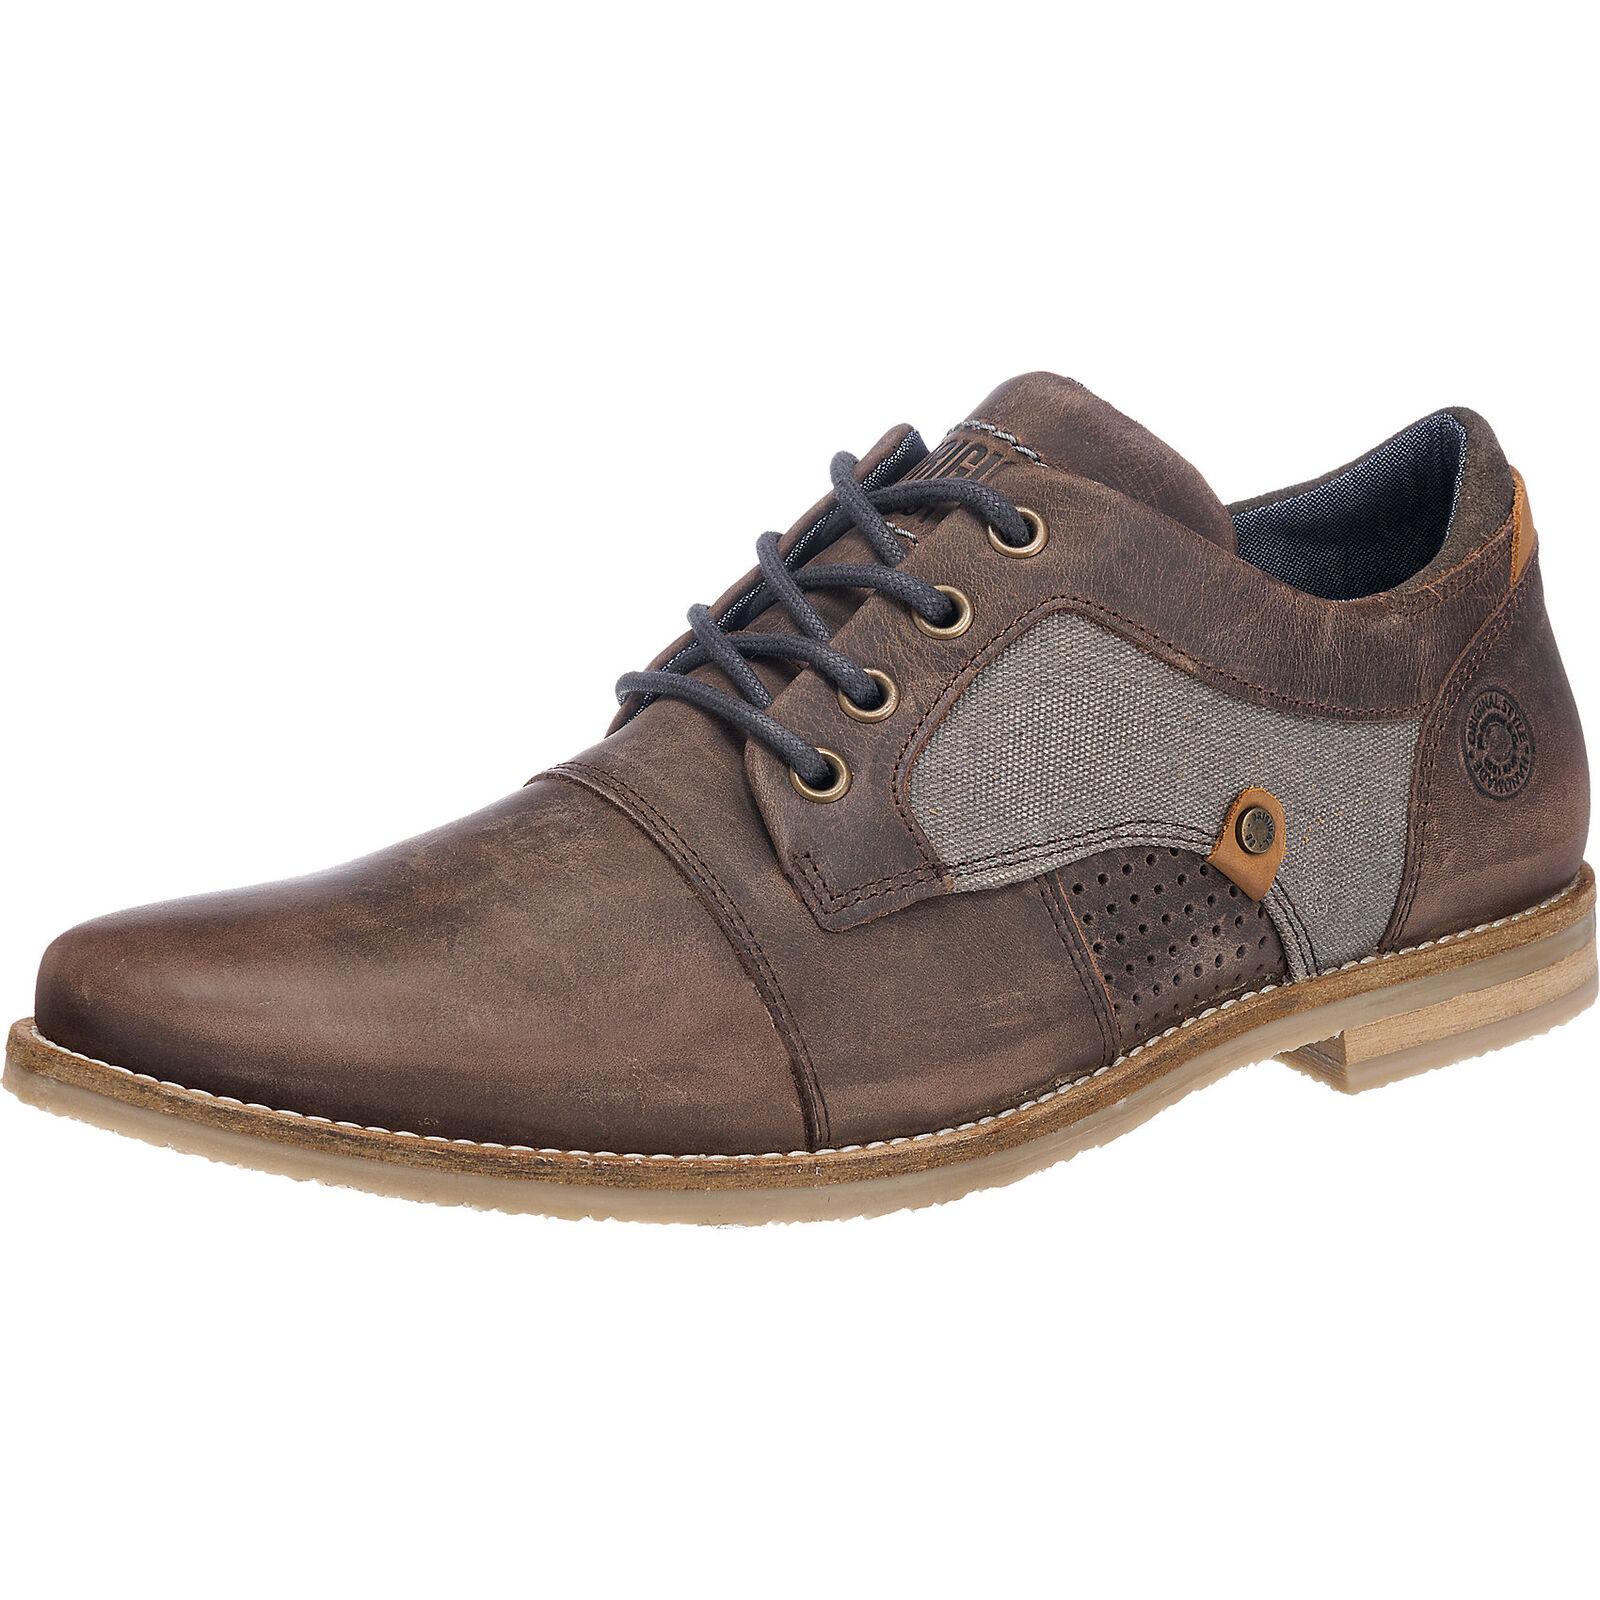 Neu BULLBOXER Freizeit Schuhe braun dunkelblau dunkelbraun 5768561